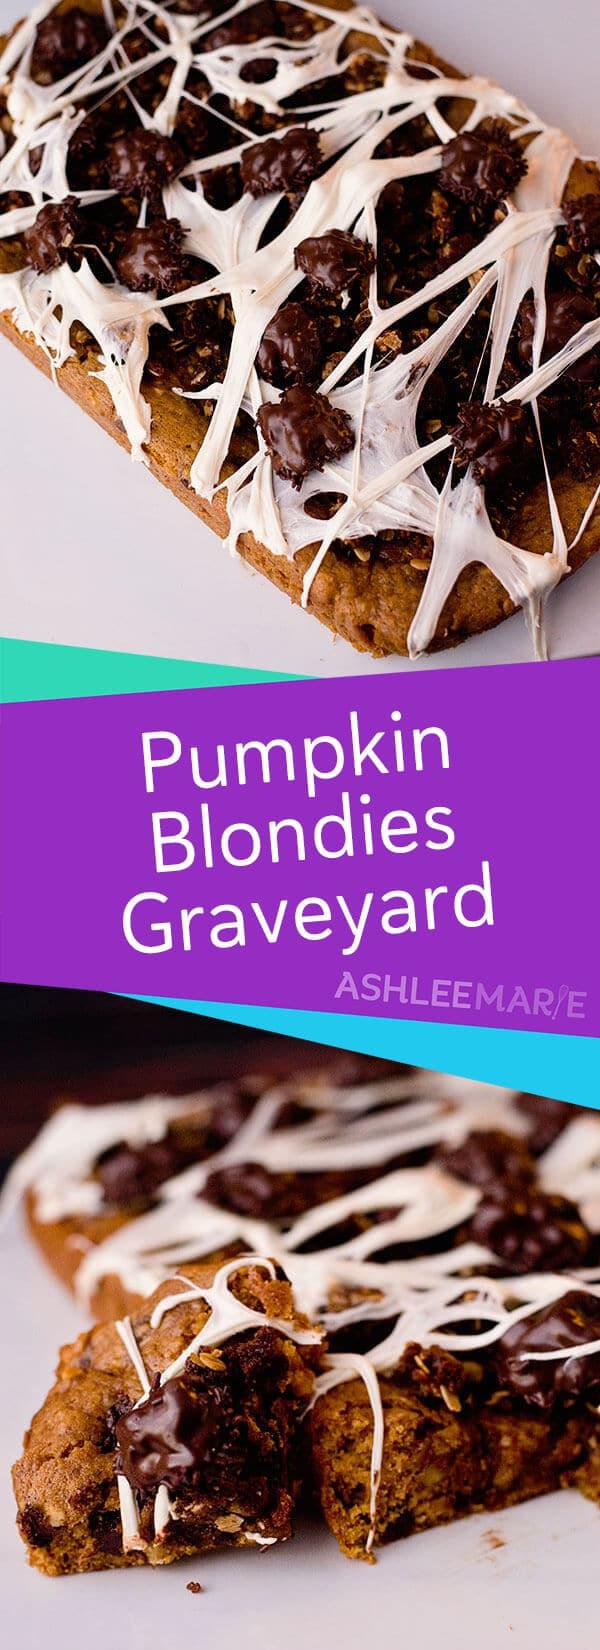 pumpkin blondie recipe